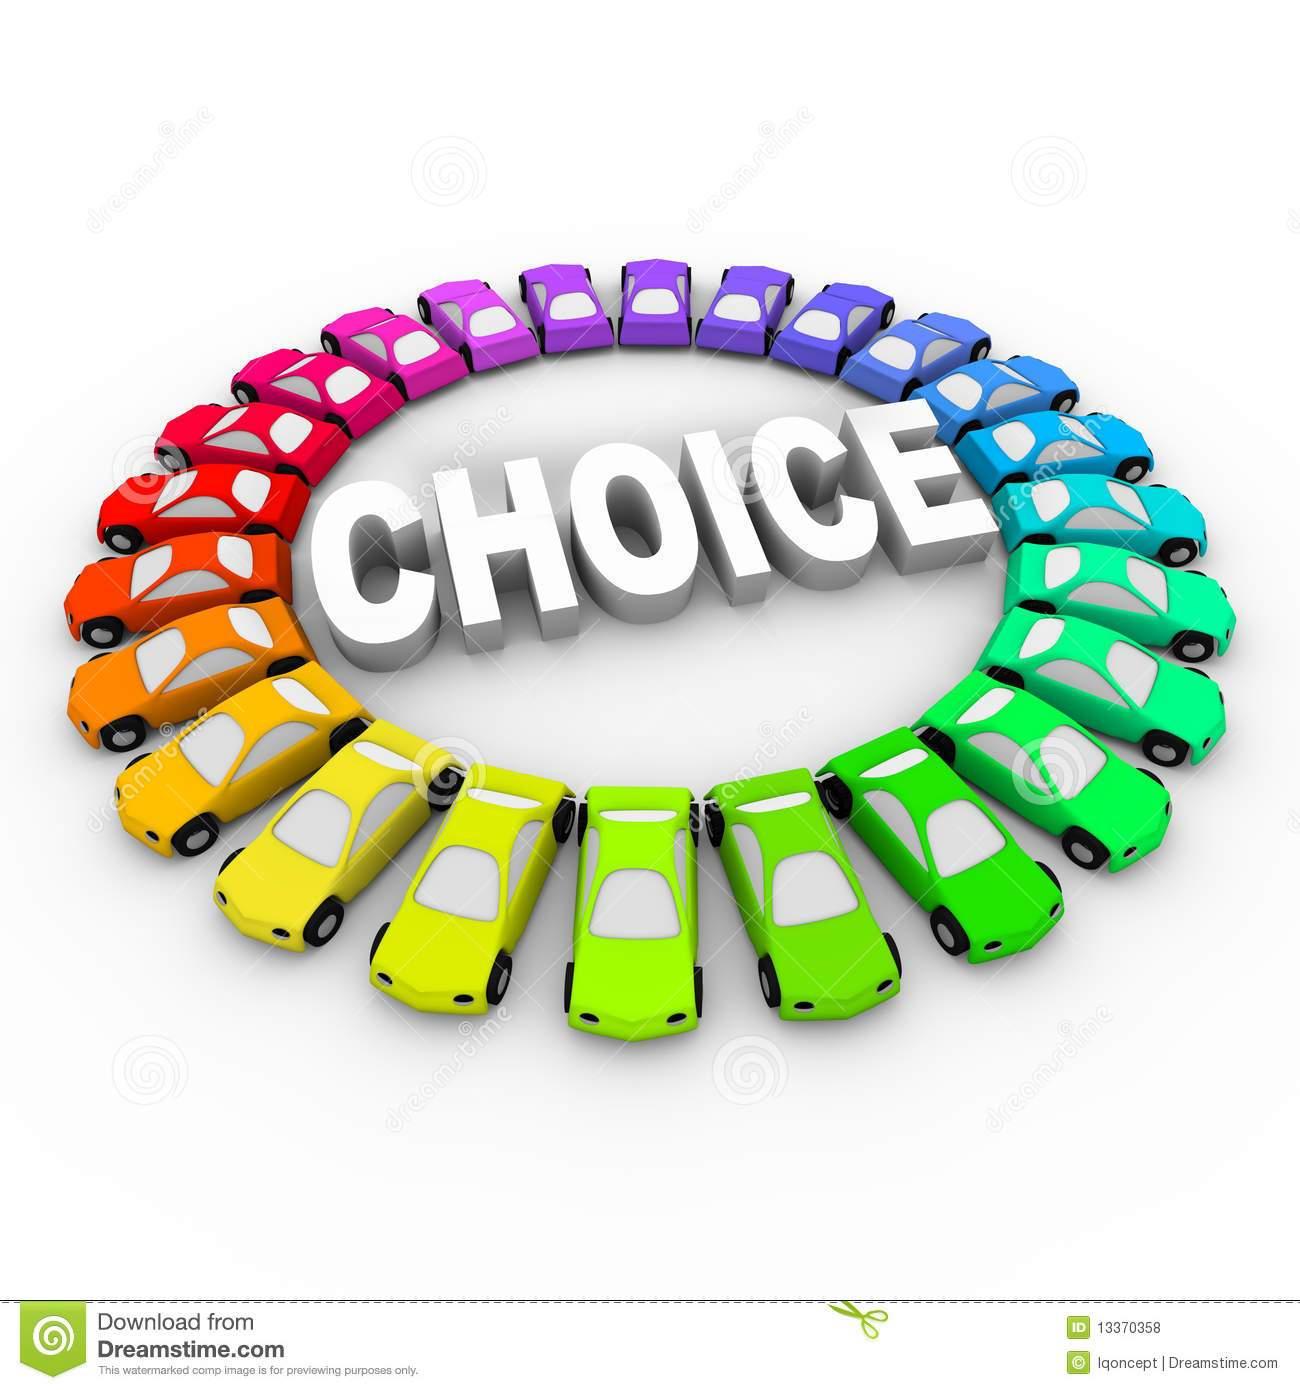 Wor choice clipart clip Word choice clipart 5 » Clipart Portal clip